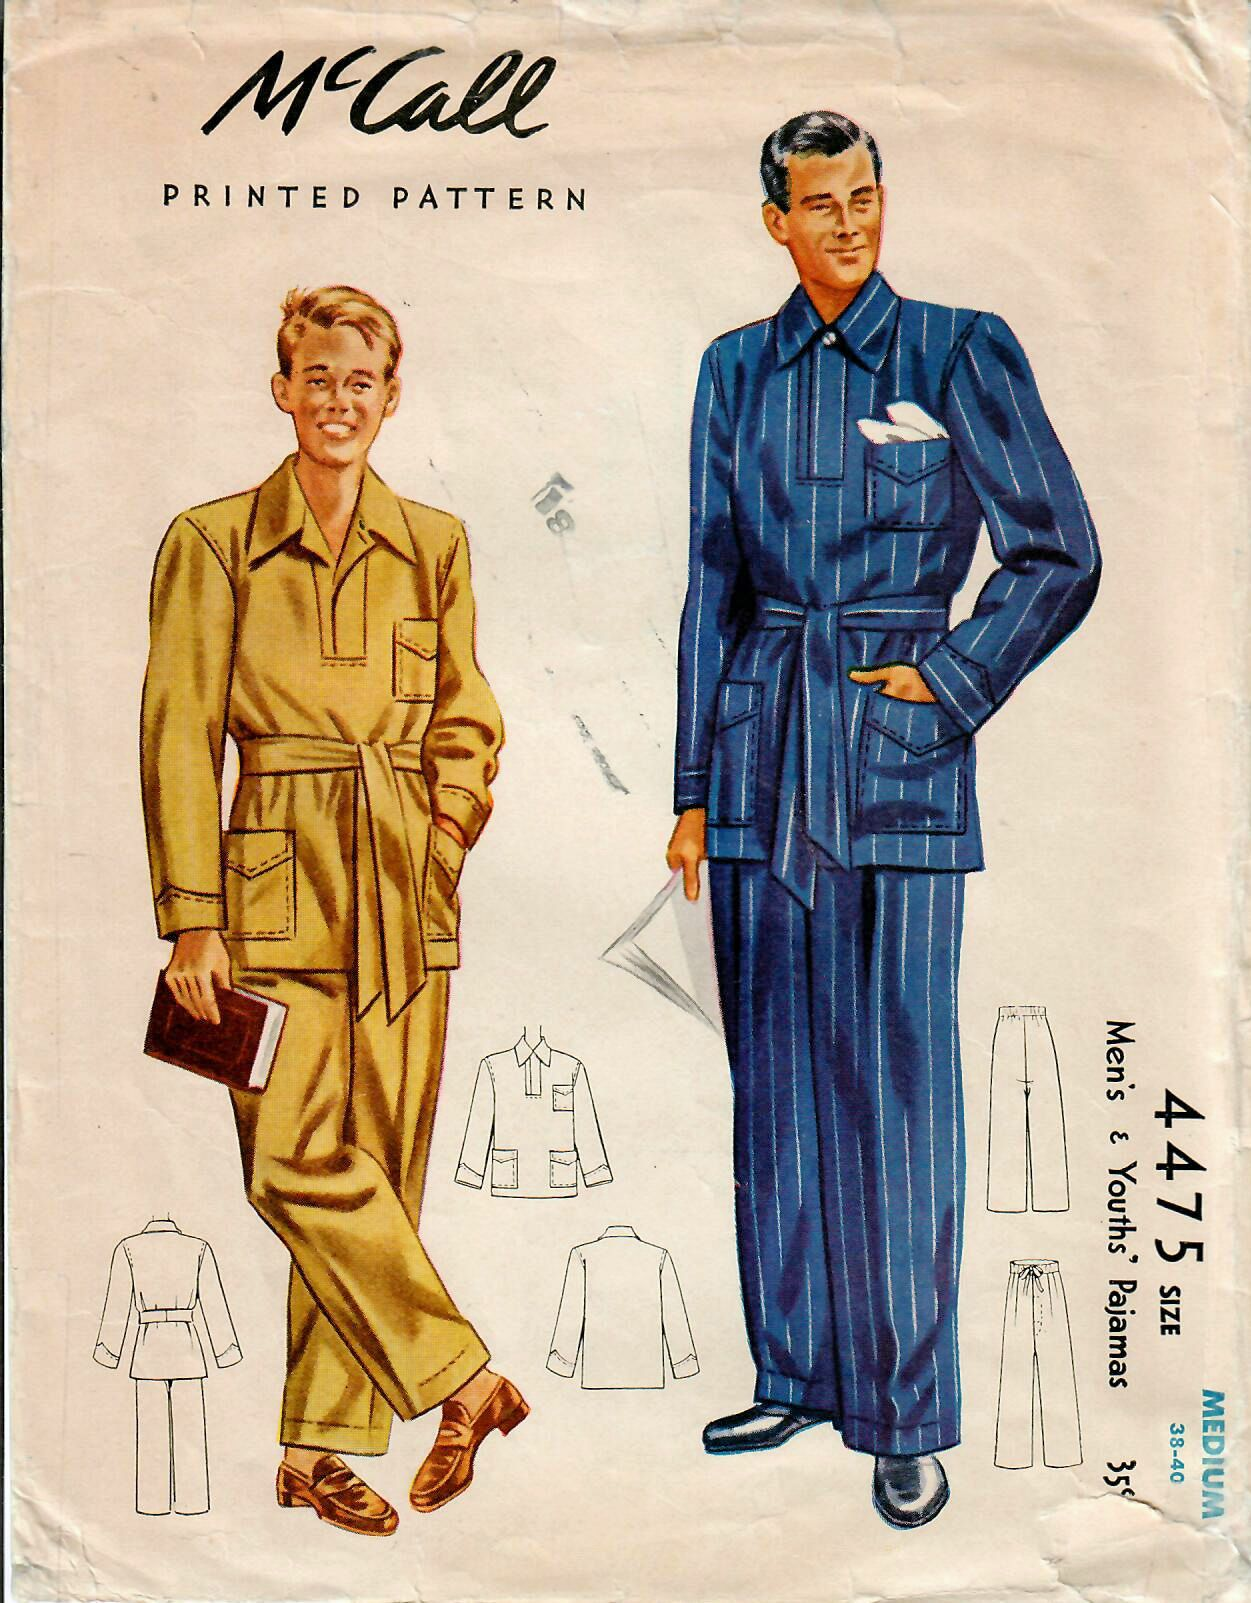 1940s mccall 4475 vintage sewing pattern mens pajamas tailored mccall 4475 vintage sewing pattern mens pajamas tailored pajamas size medium by midvalecottage on etsy jeuxipadfo Choice Image